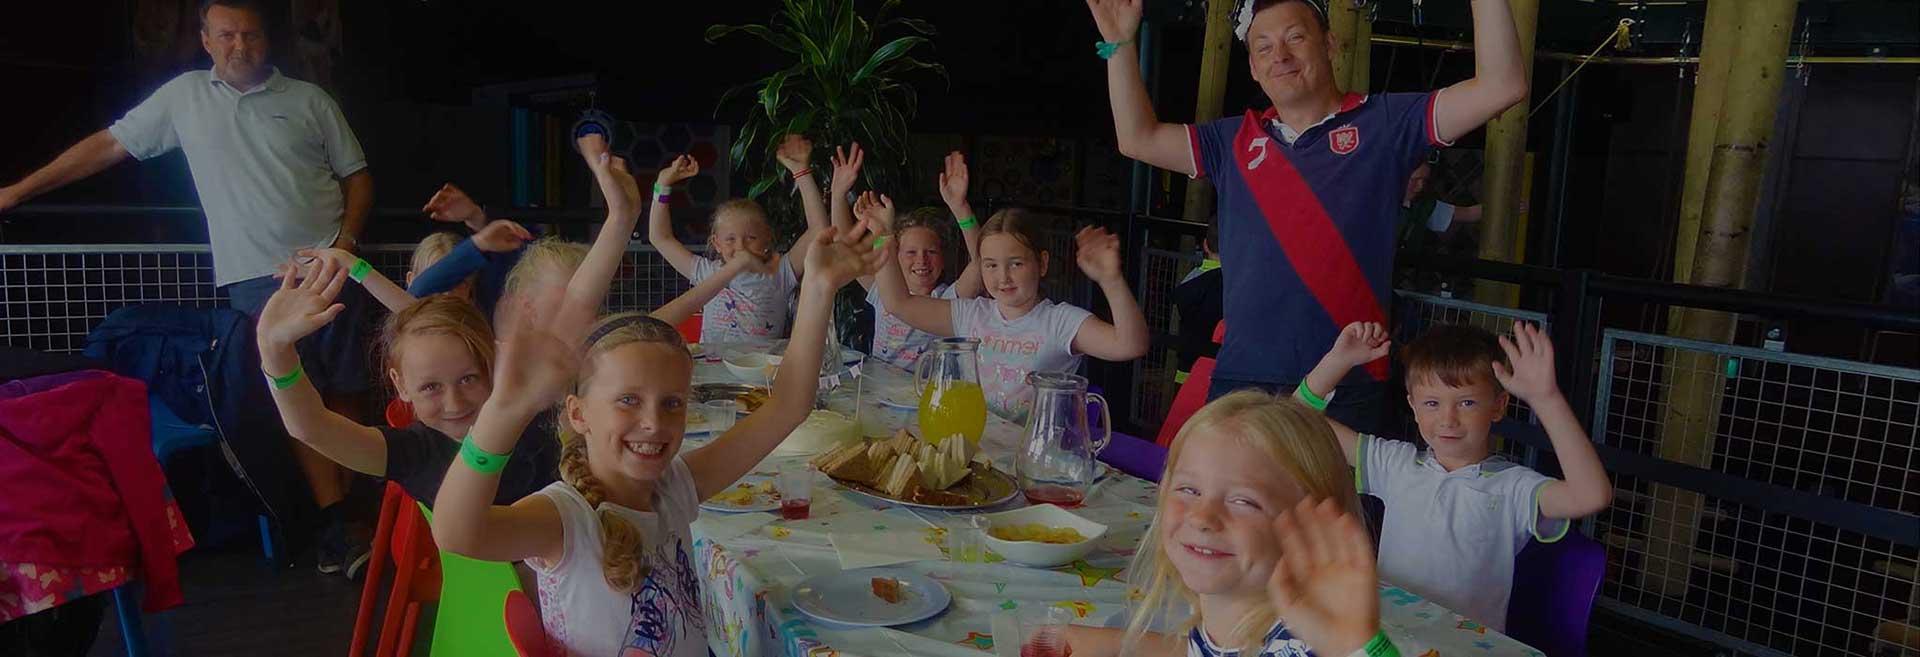 Childrens-birthday-party-min